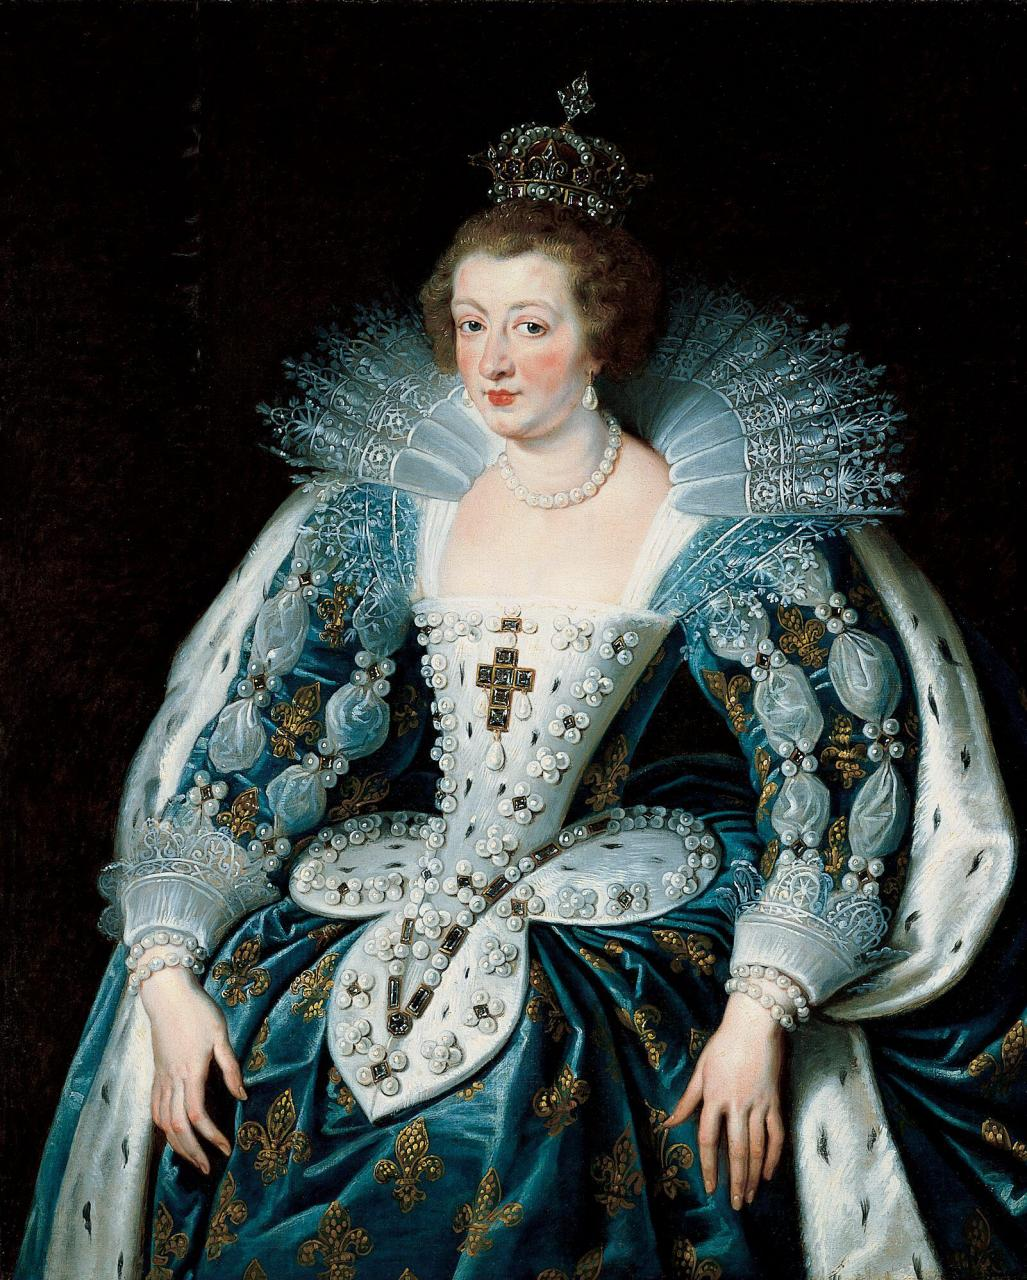 Anna_of_Austria_by_Rubens_(1622-1625,_Norton_Simon_Museum).jpg